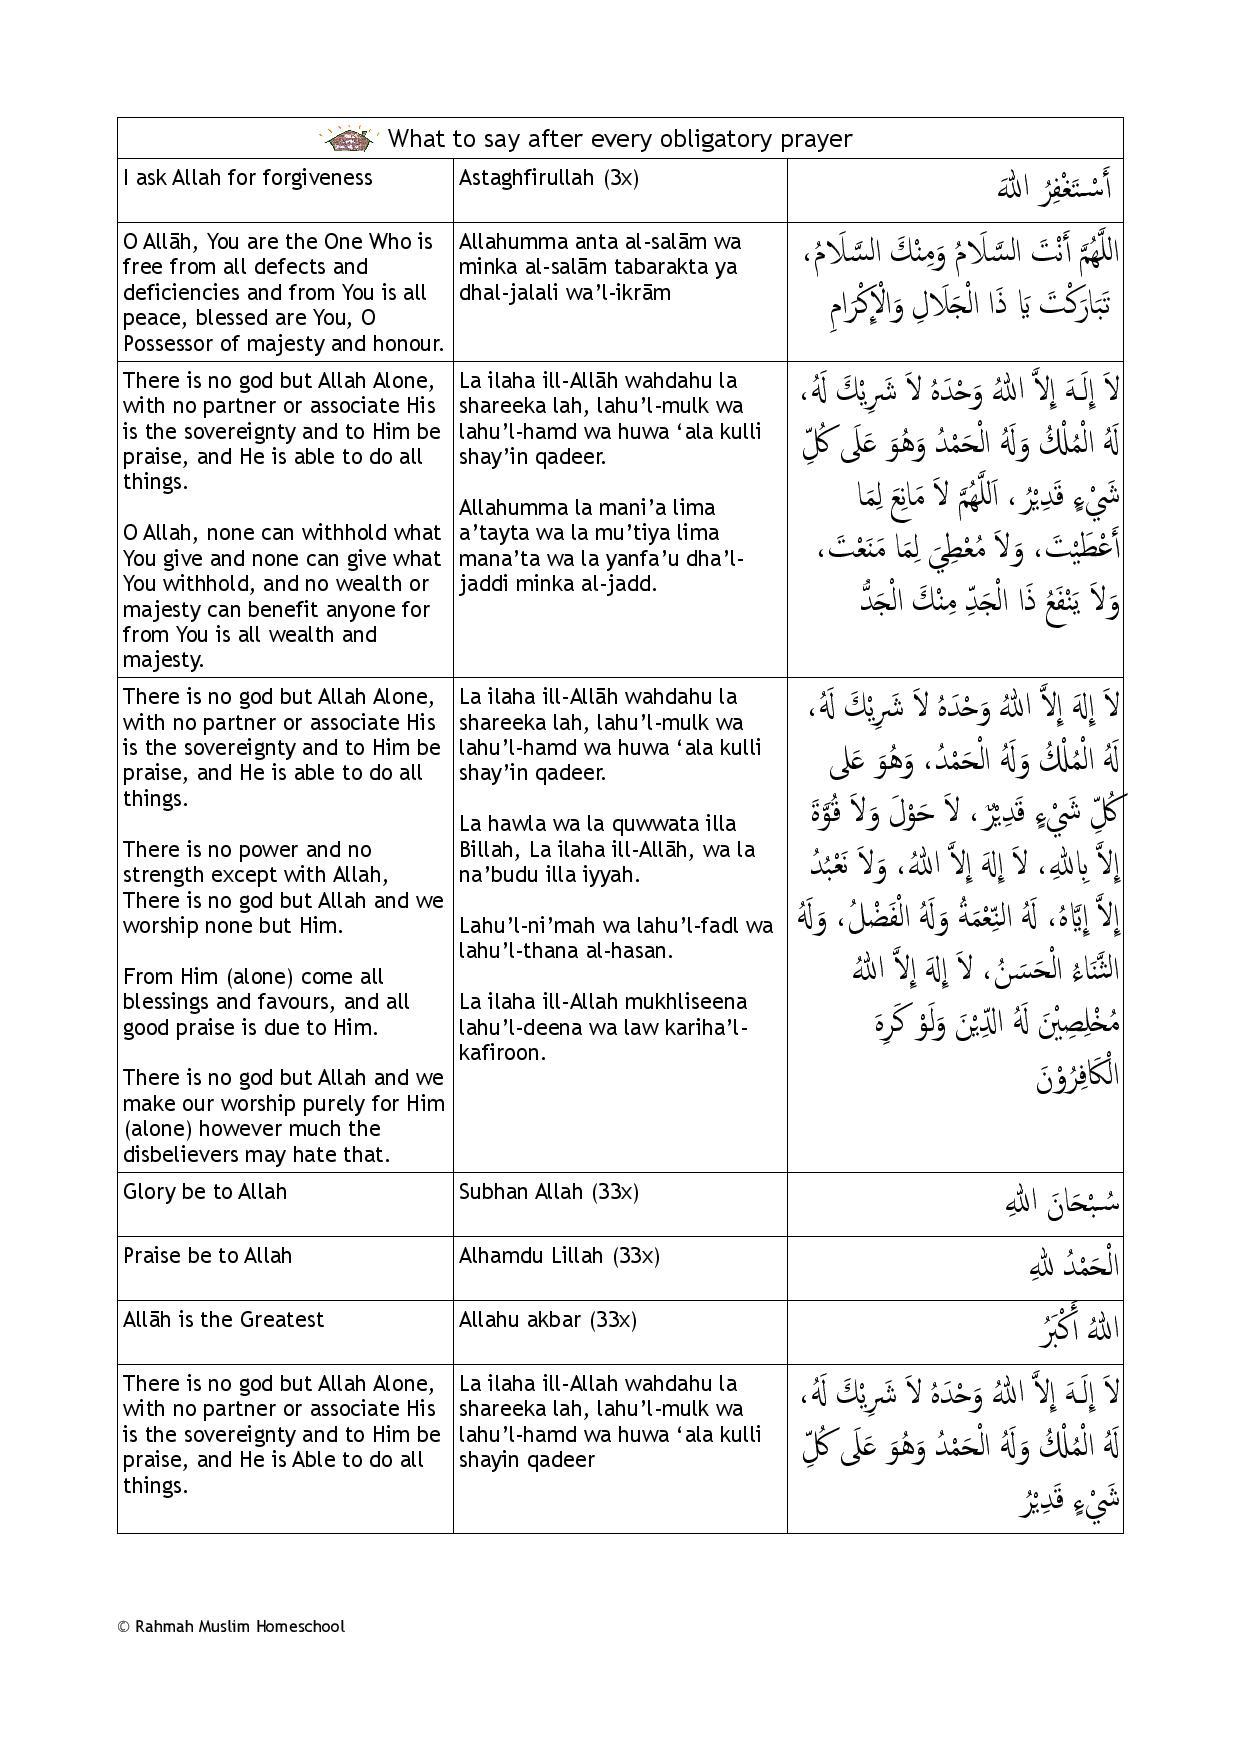 Printable Dua After Obligatory Salah